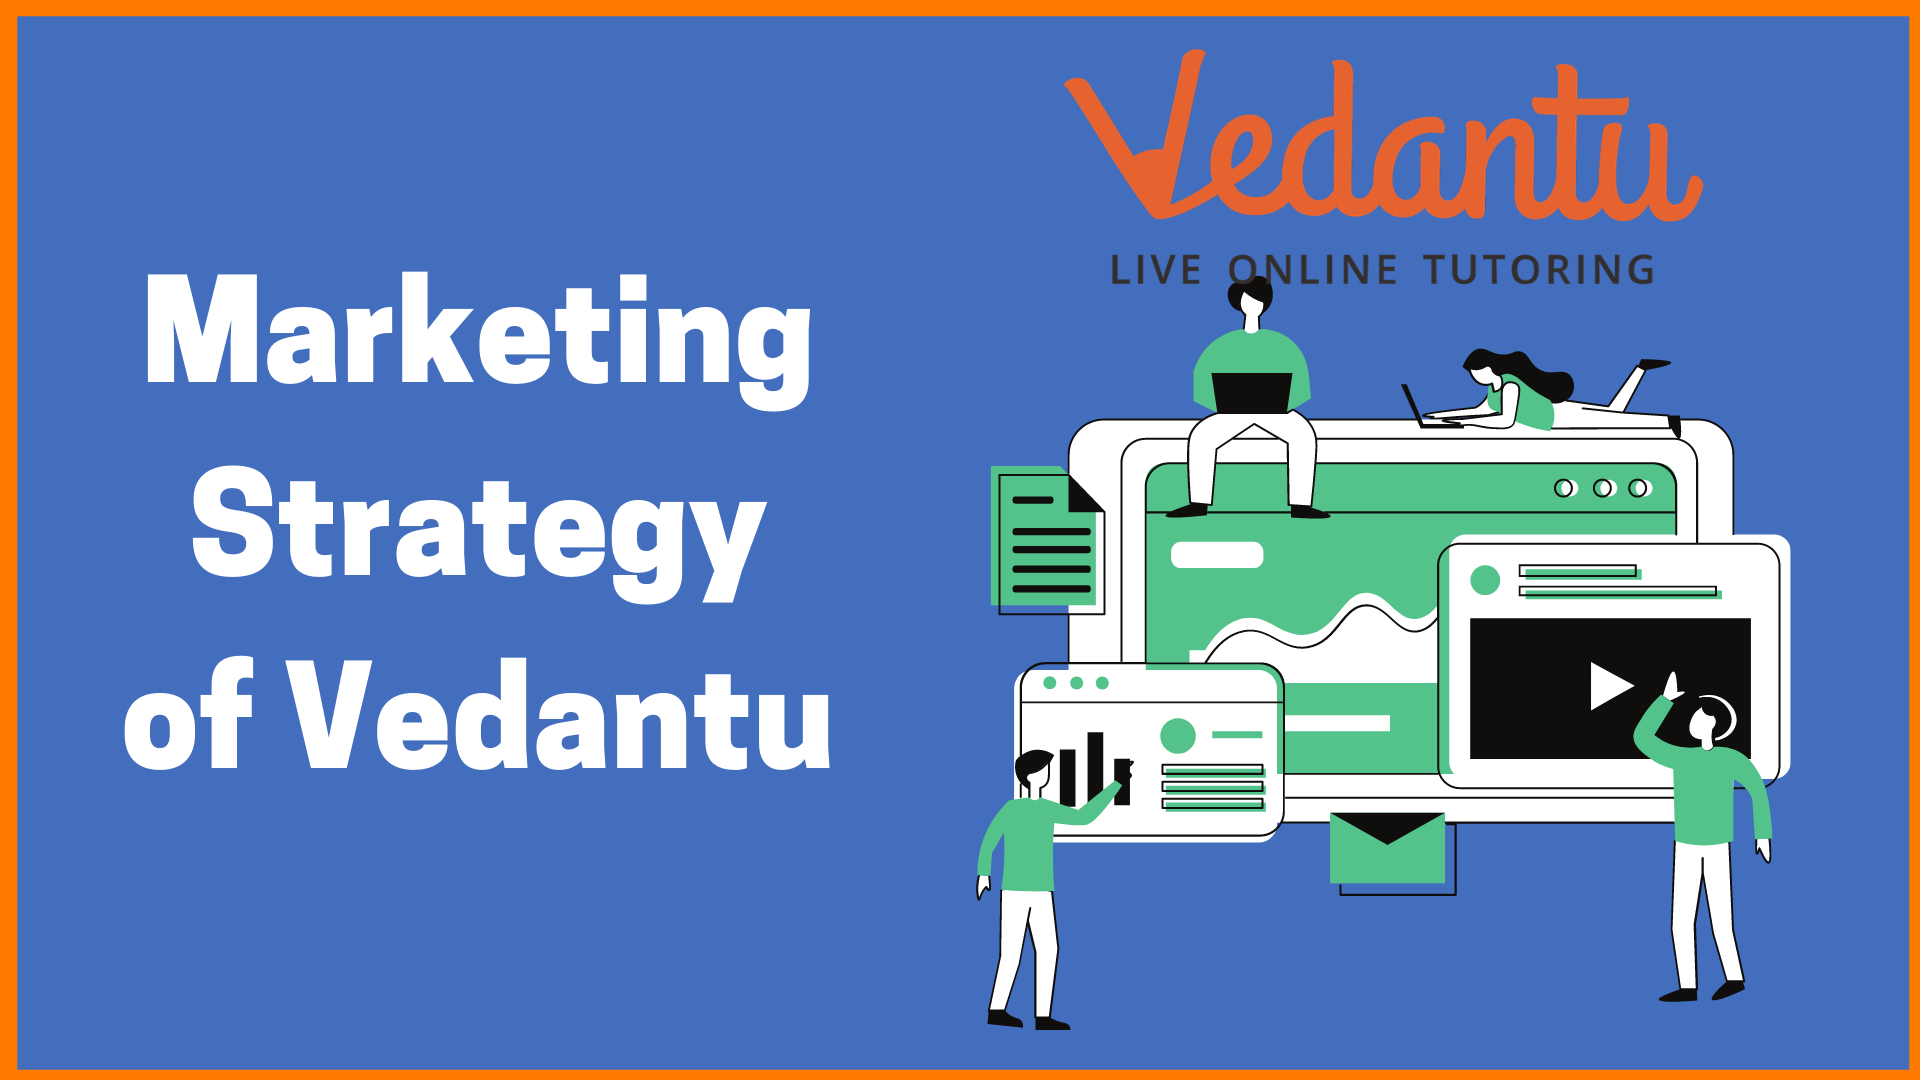 Marketing Strategy of Vedantu